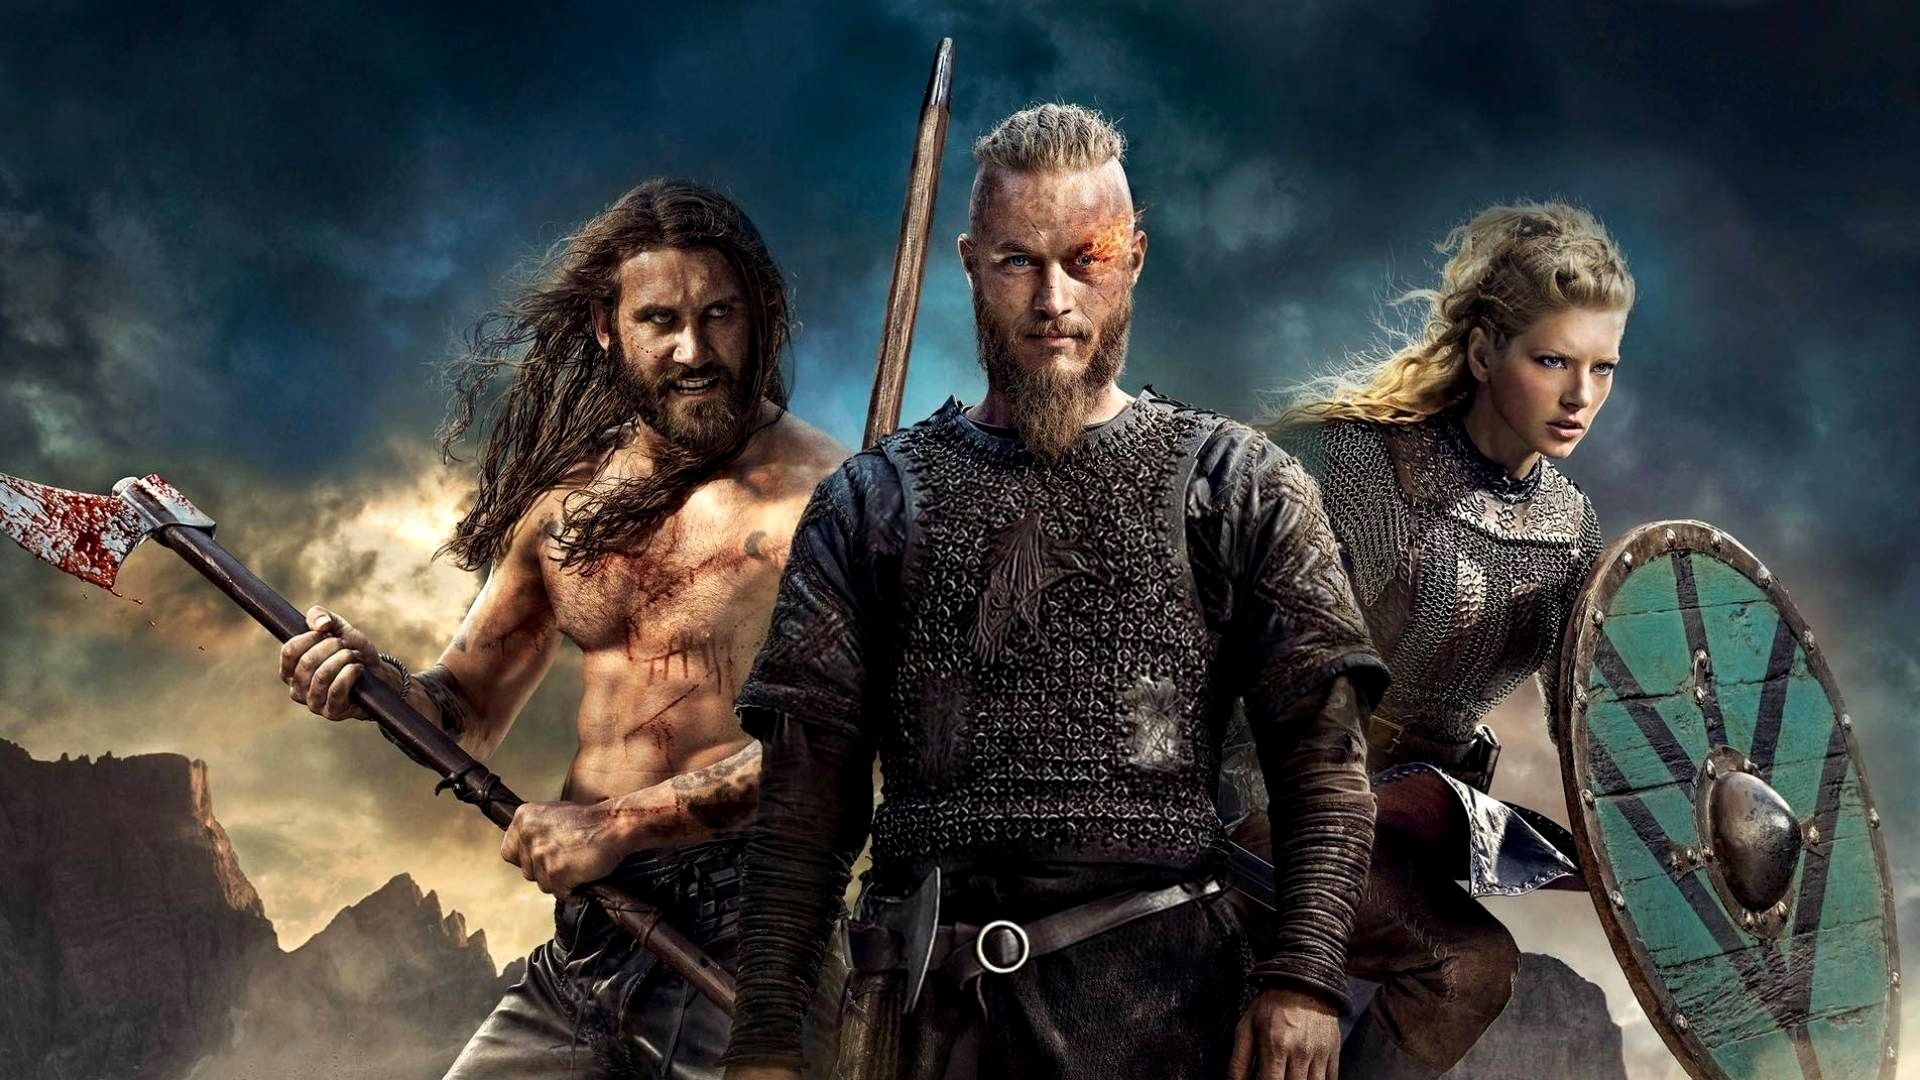 Vikings Wallpaper 4k Hd Gallery Viking Perang Kuda